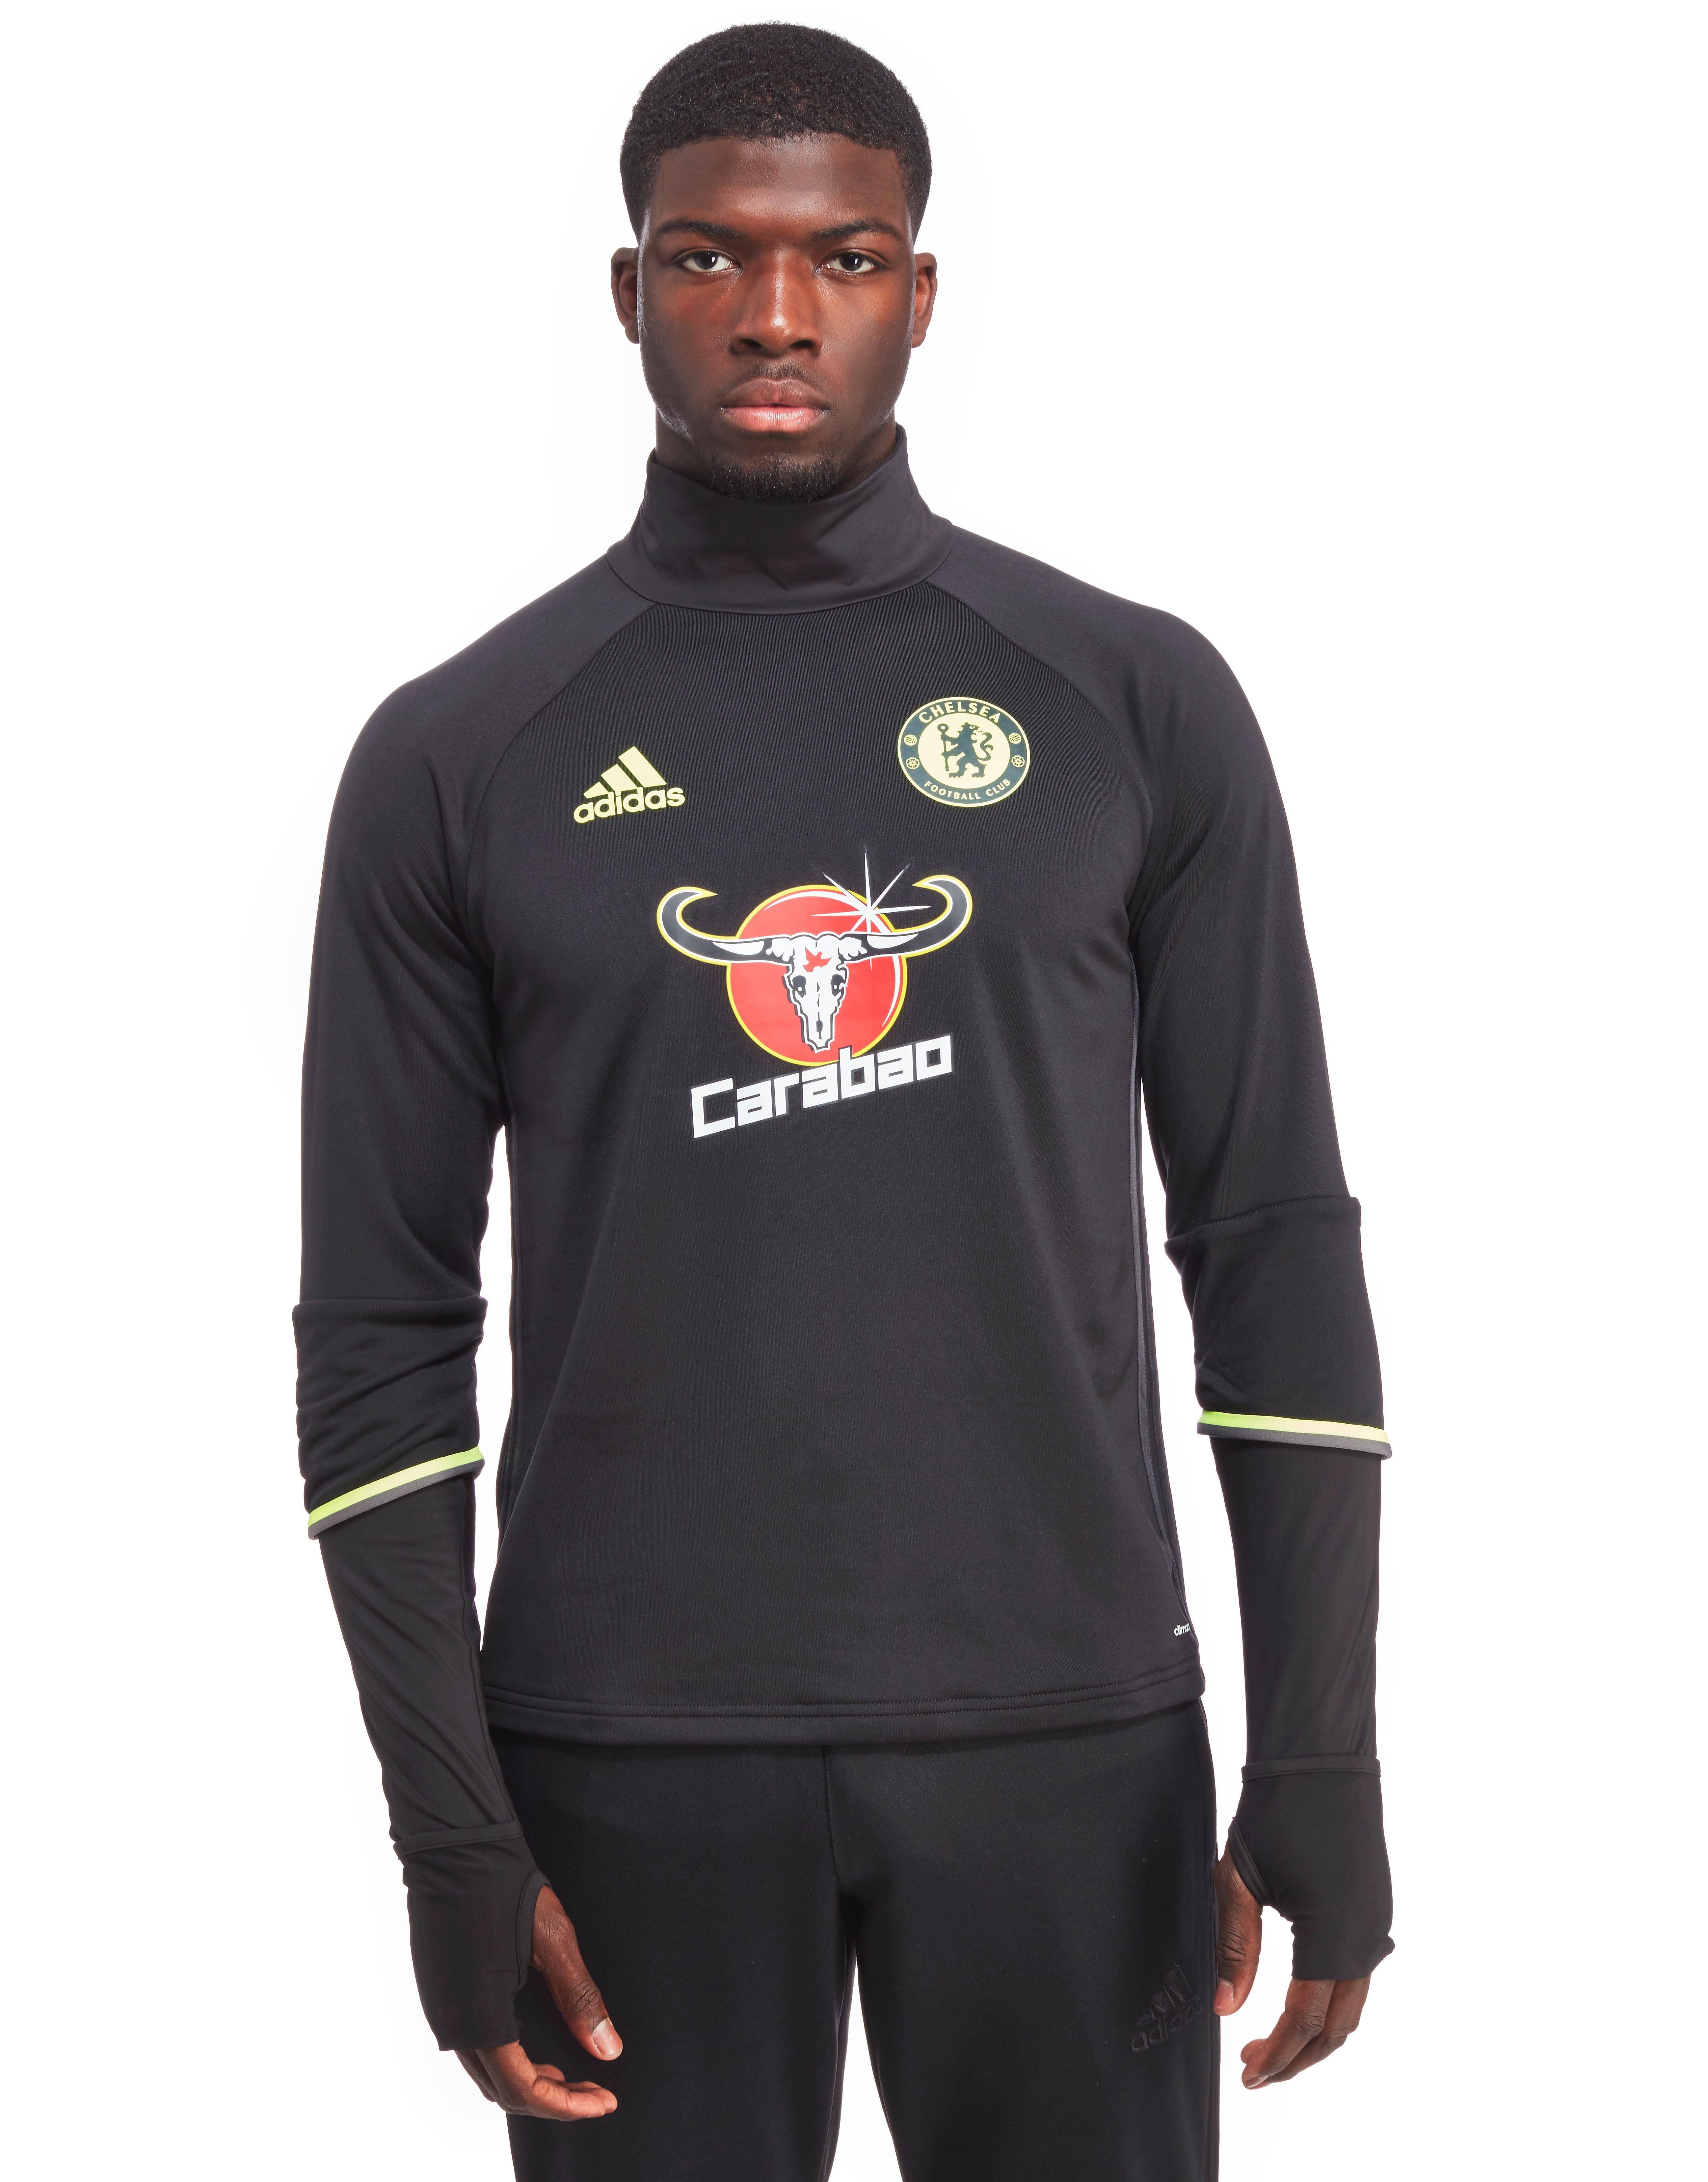 adidas Chelsea FC Training Top